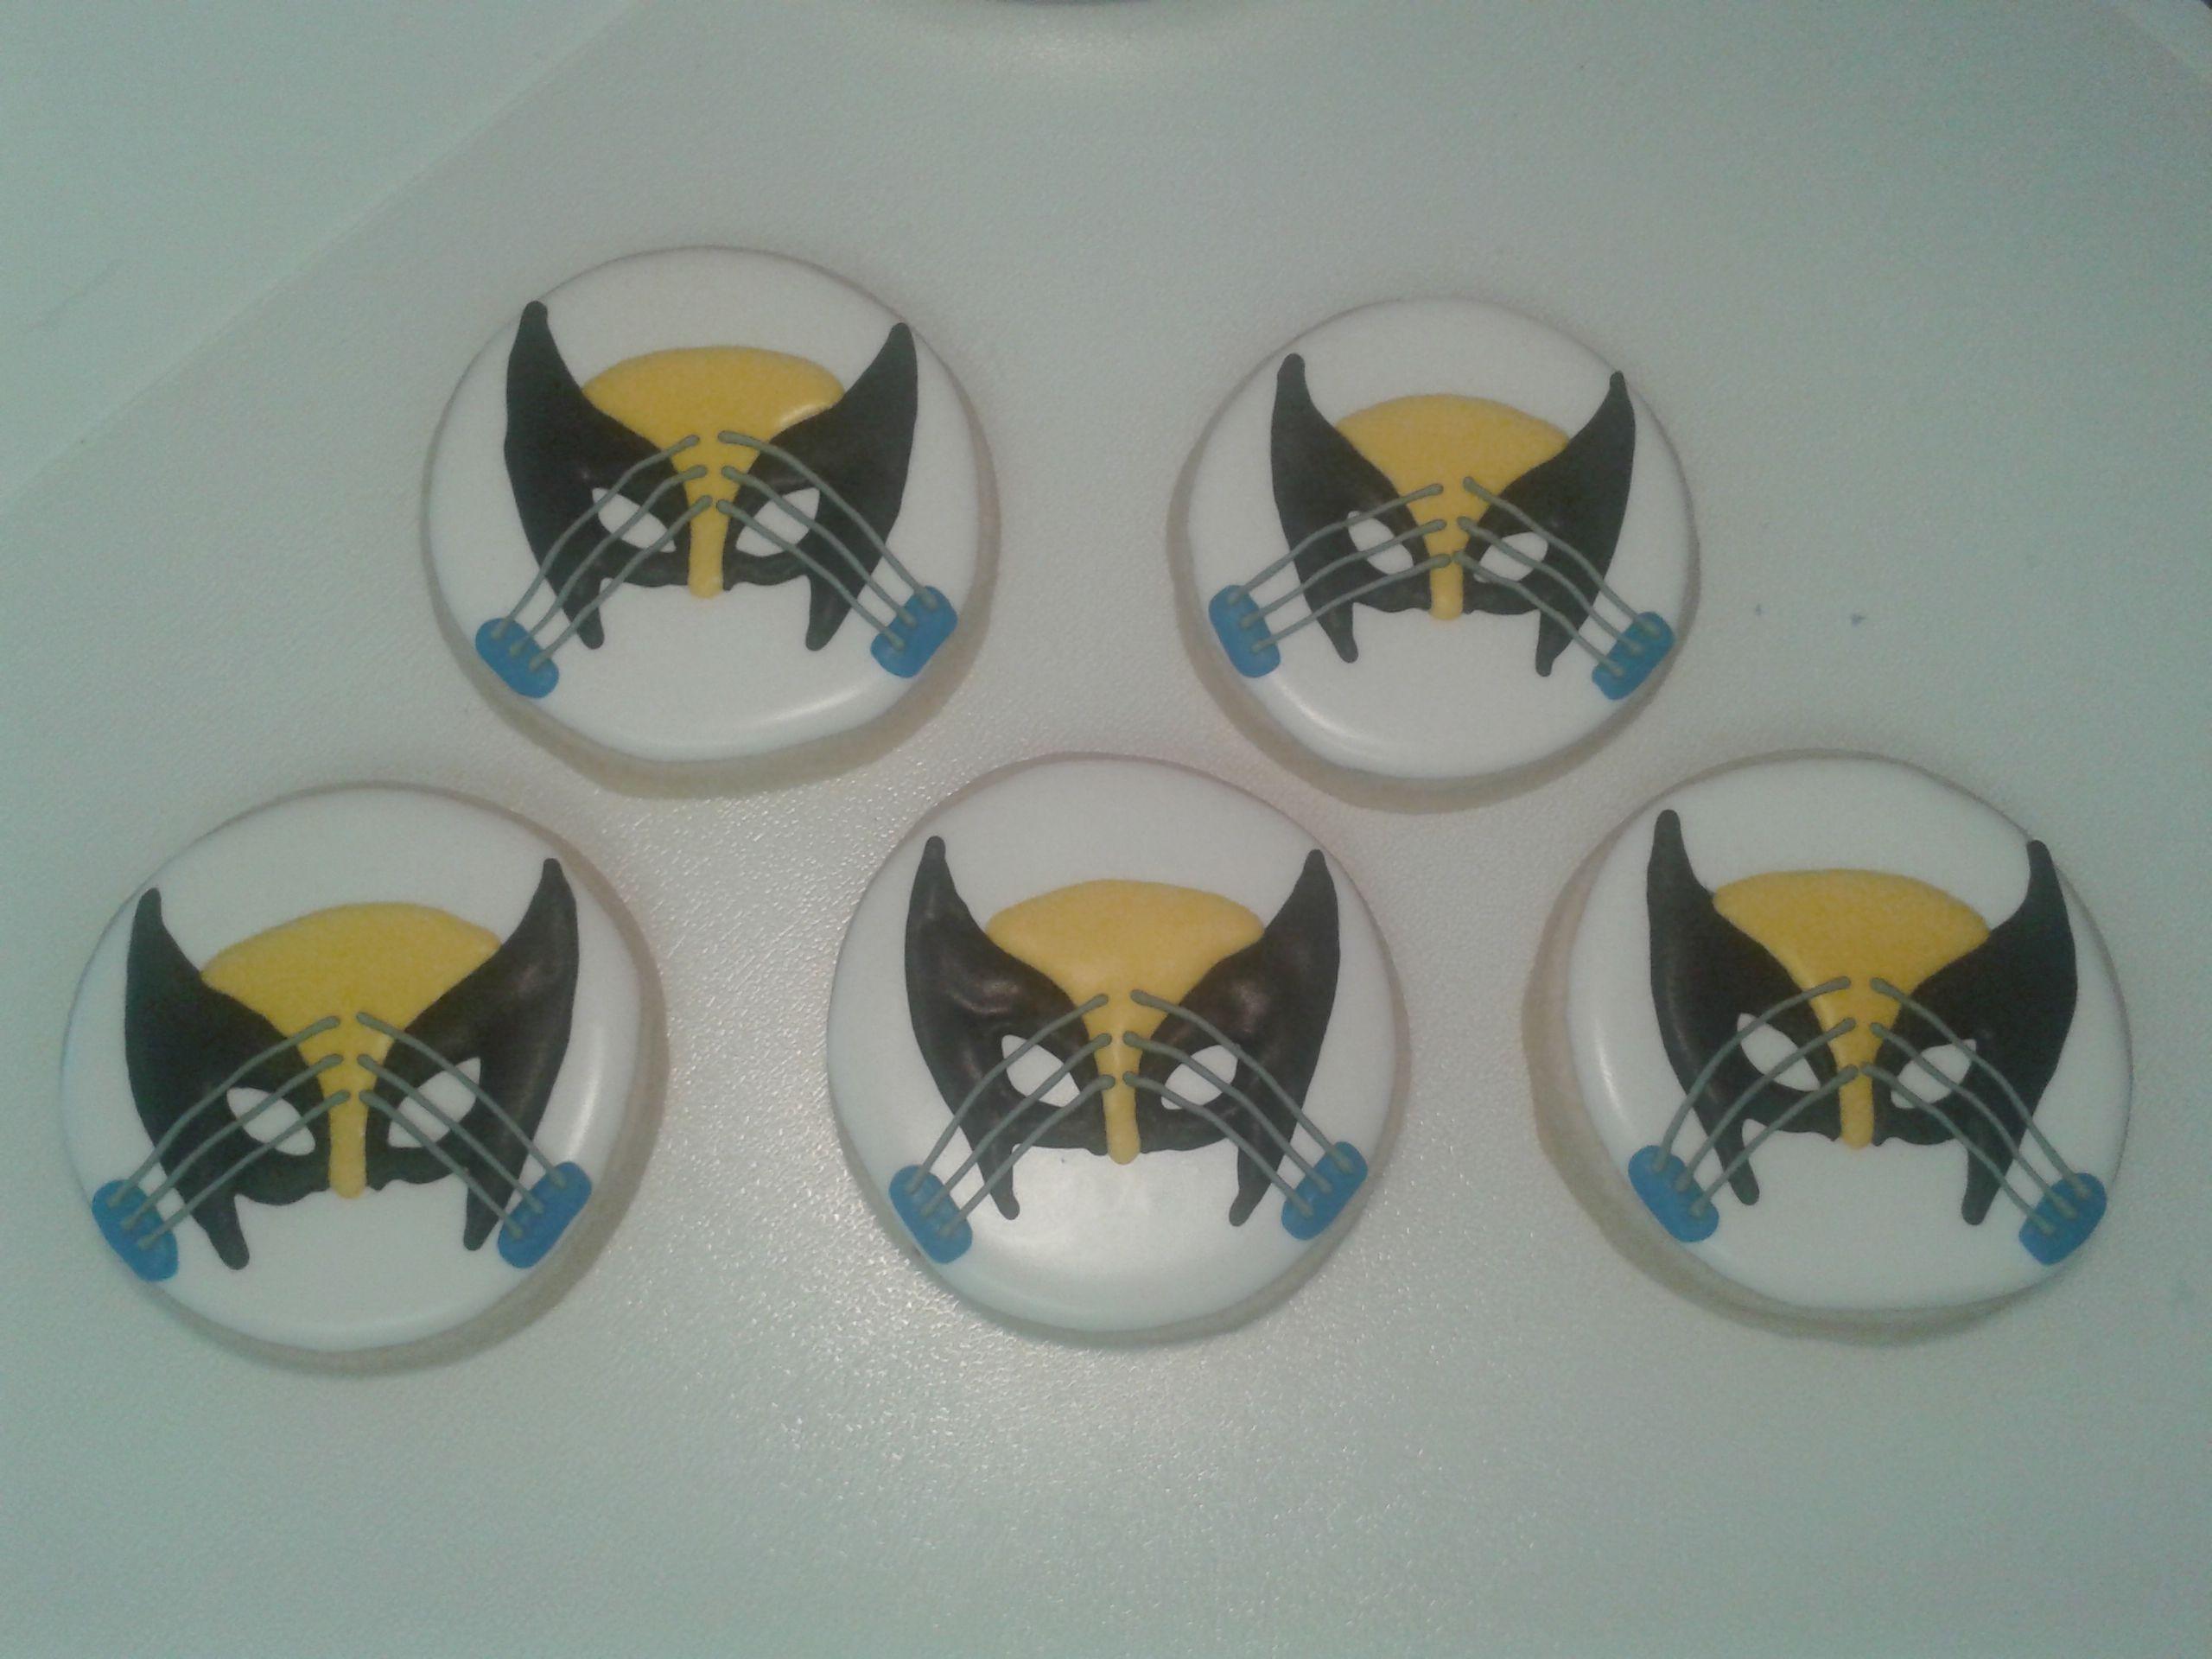 3pk wolverine leather work gloves extra large - Wolverine